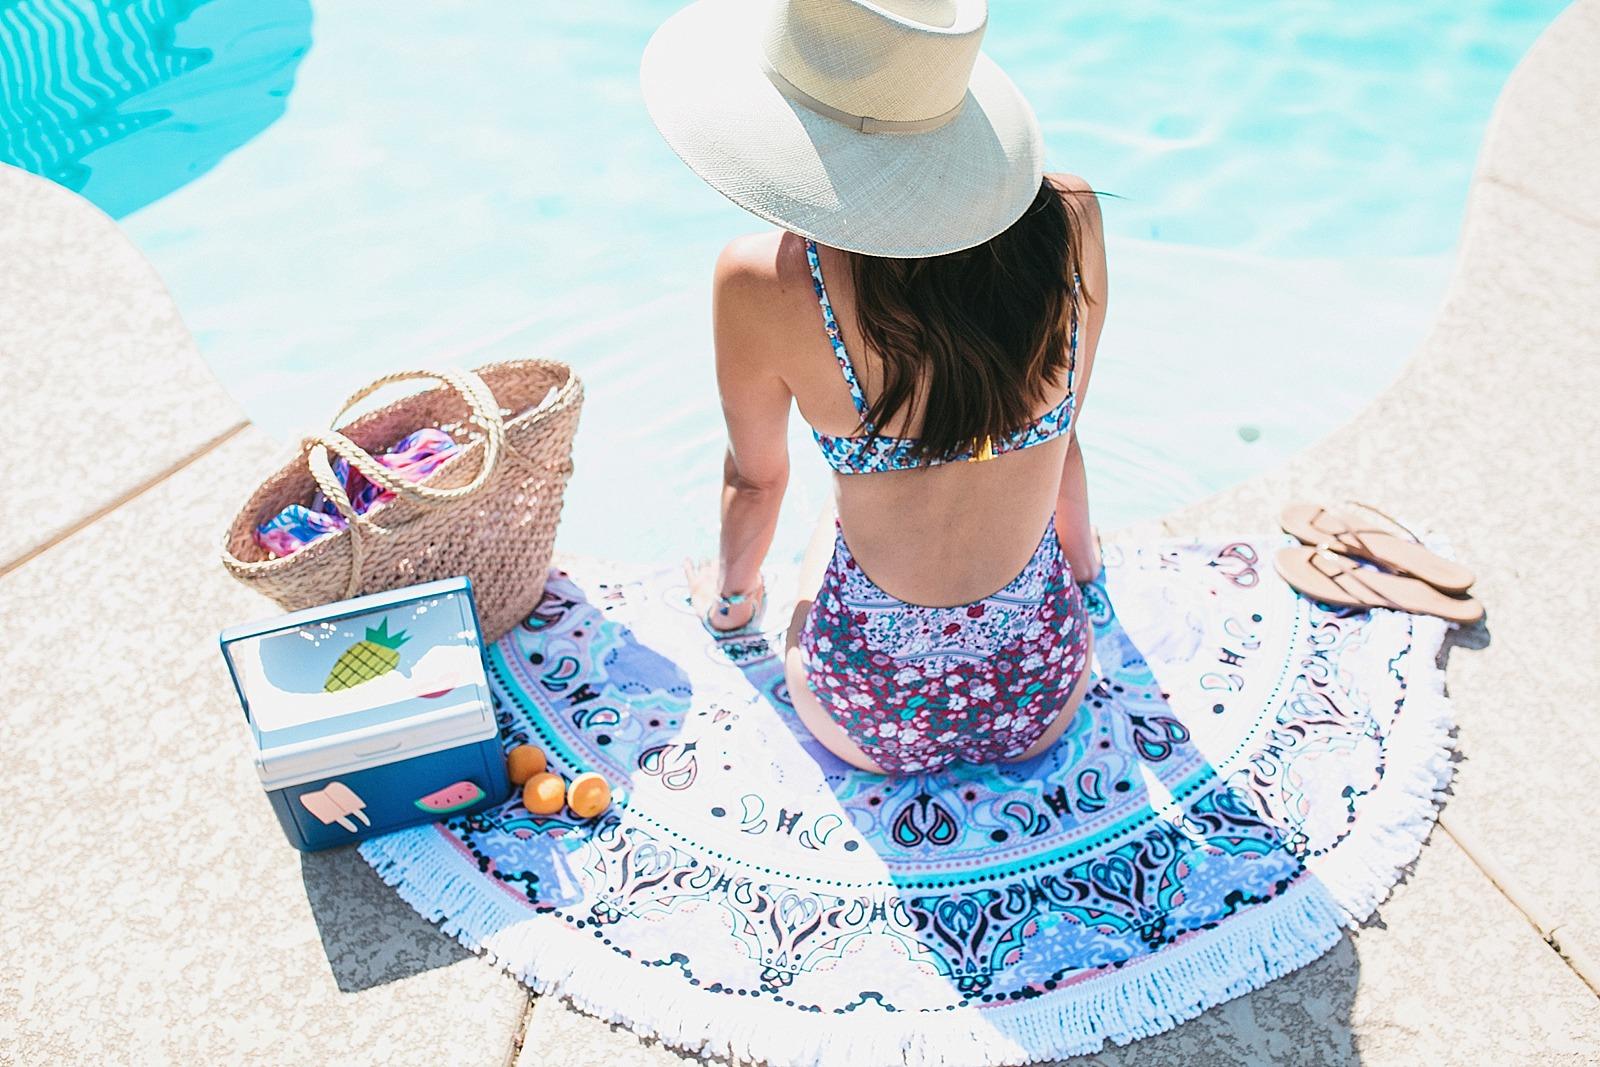 weight-watchers-pool-ready-summer-photoshoot-pool-shoot-model-lifestyle-blogger-arizona-phoenix-diana-elizabeth-blog-_0041